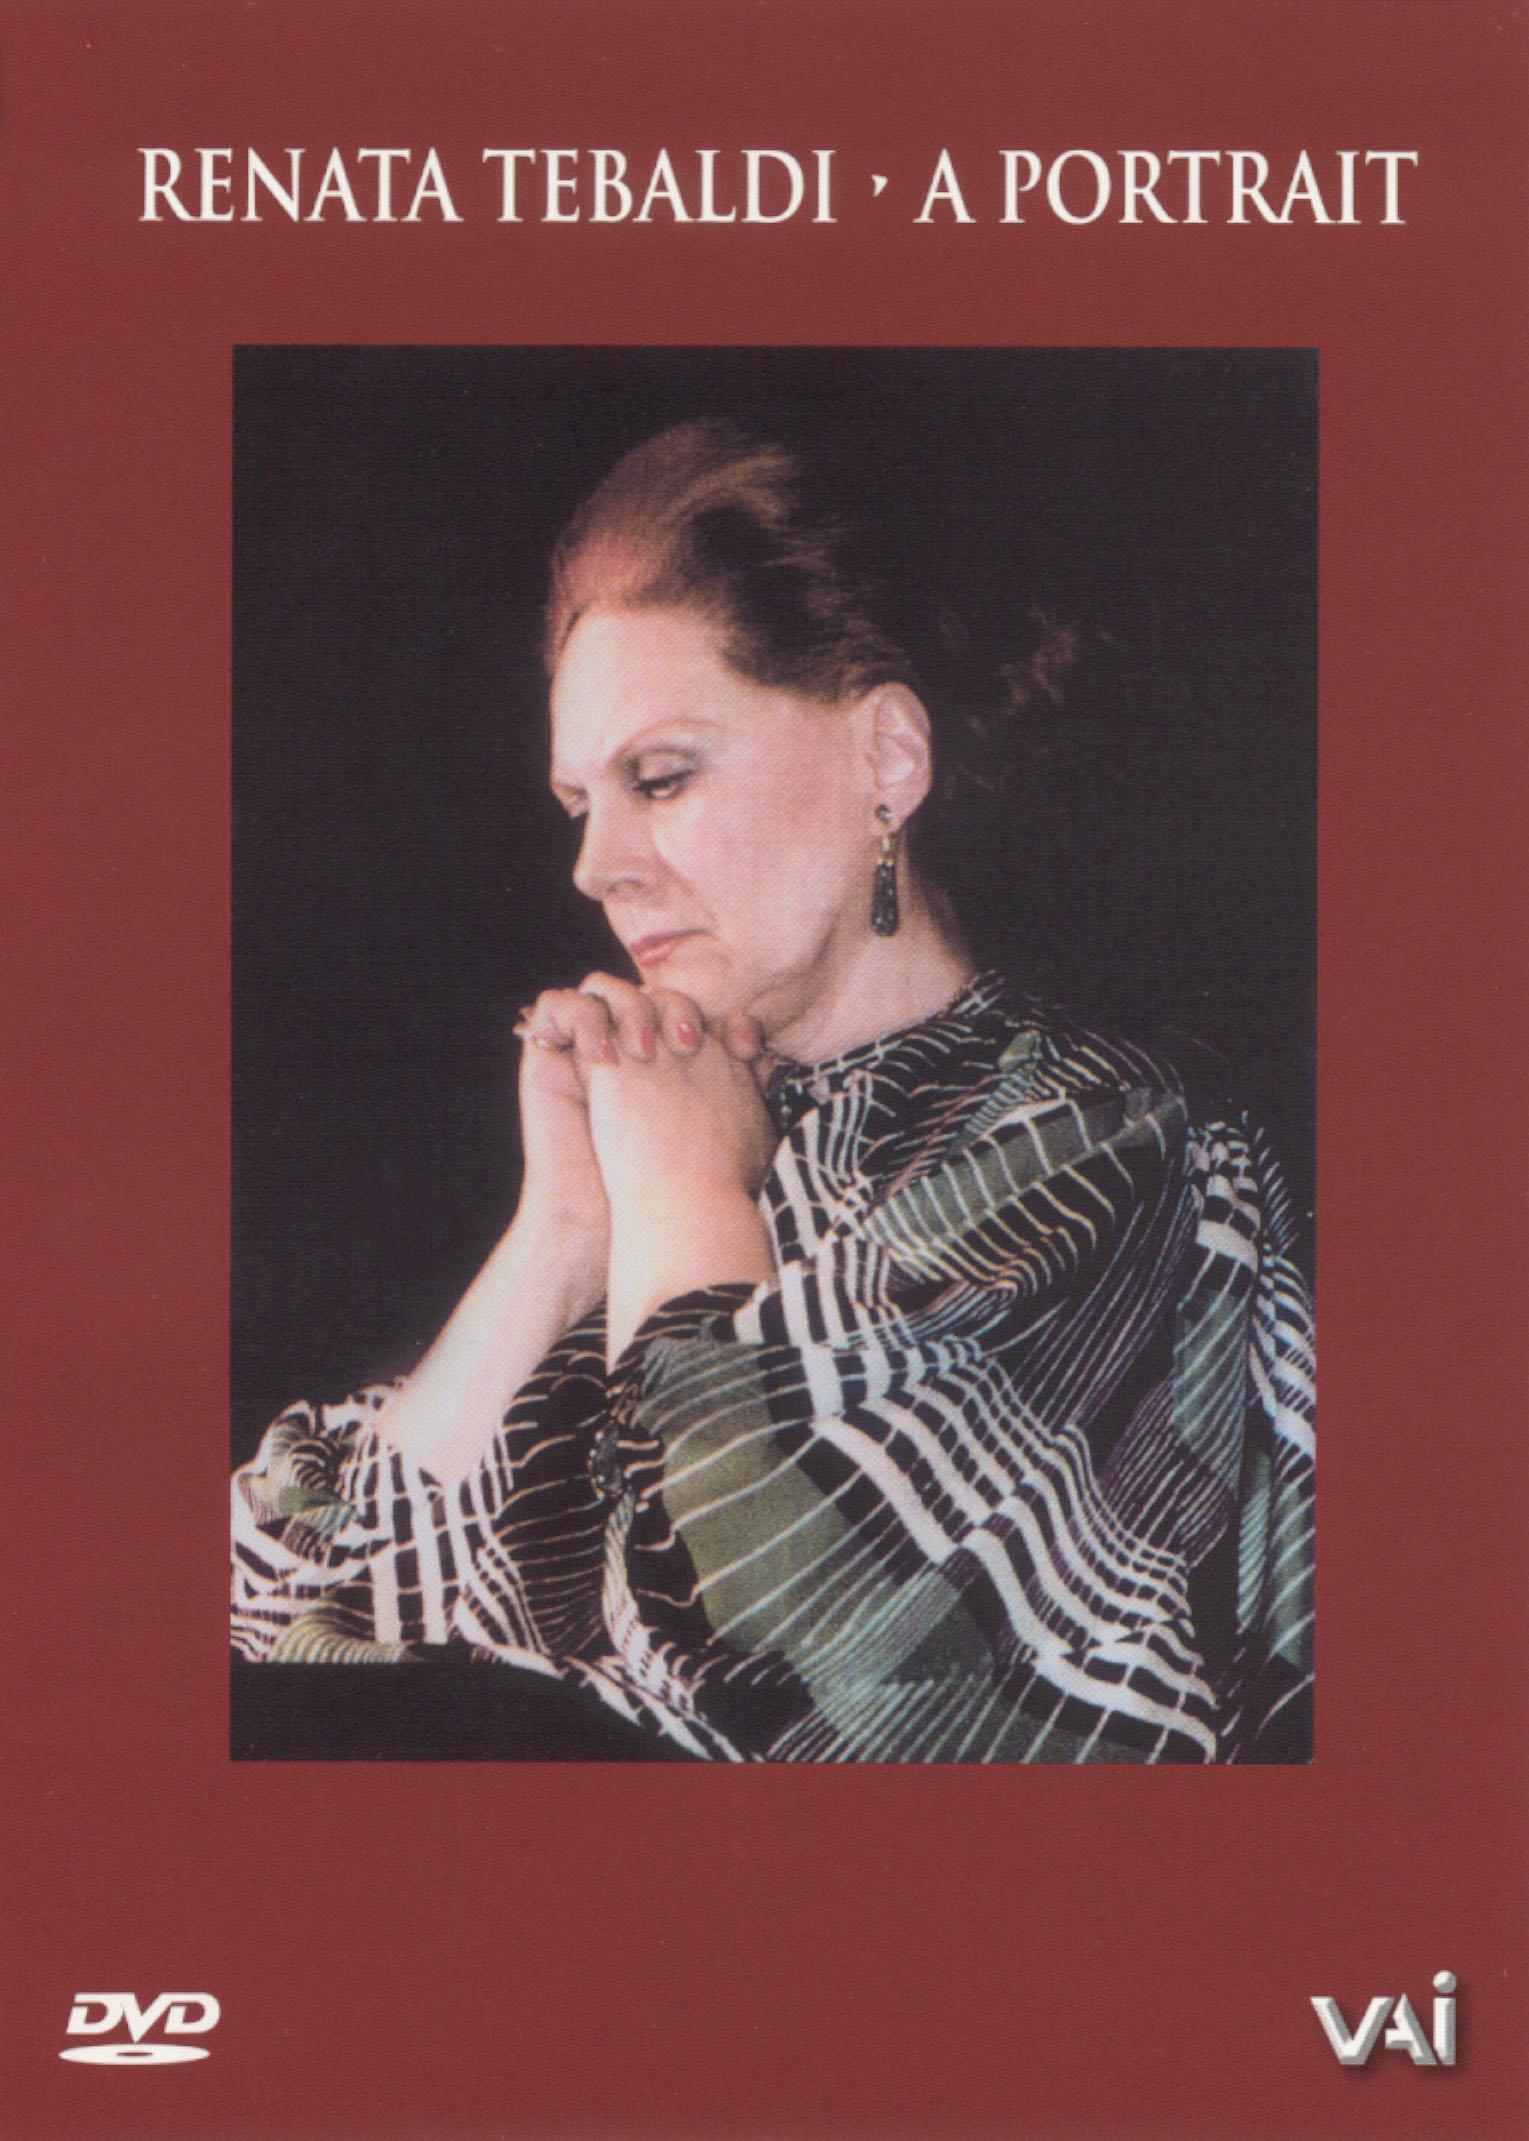 Renata Tebaldi: Portrait